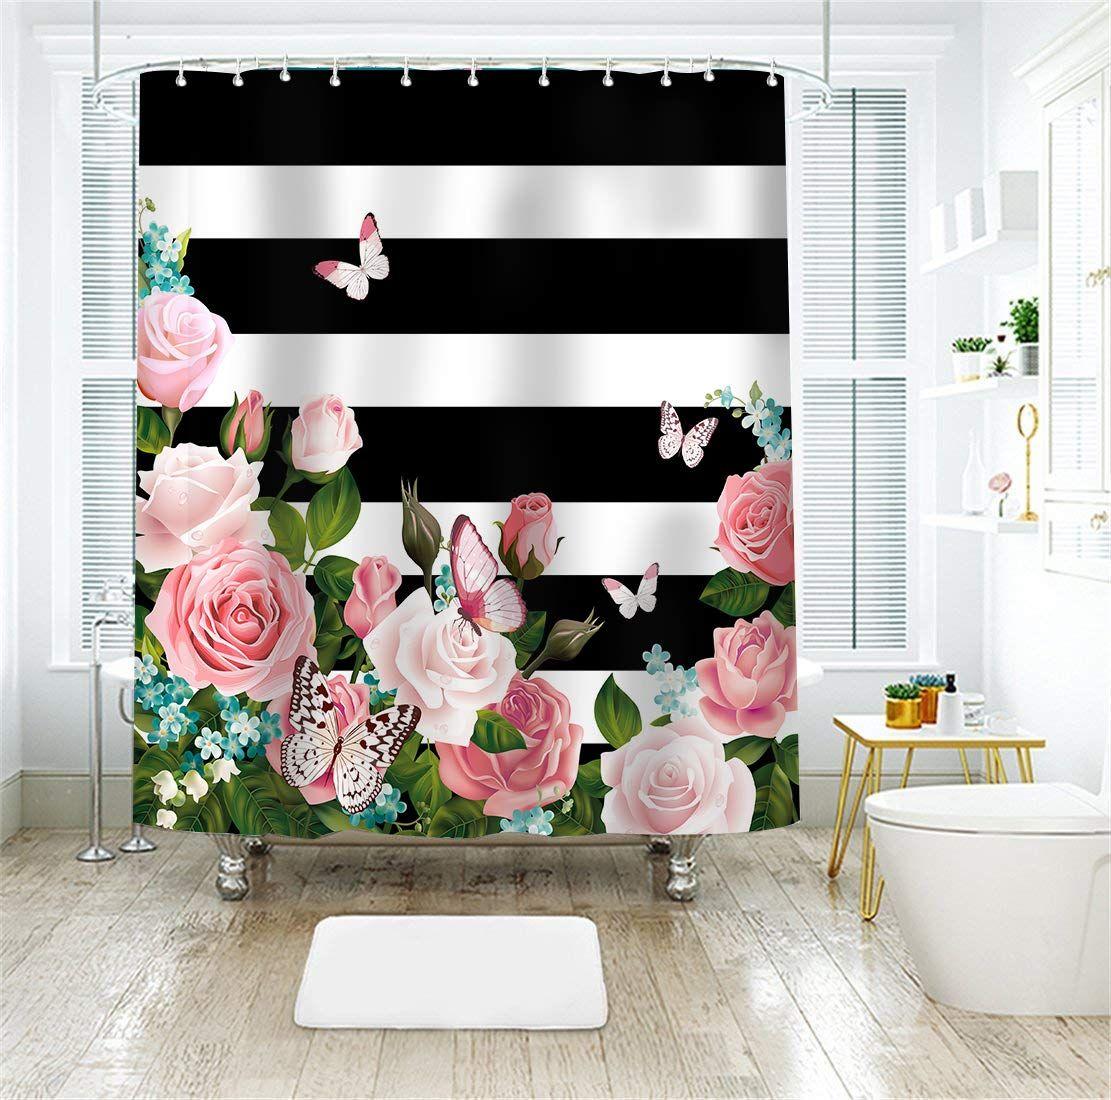 Livilan Striped Shower Curtain Black And White Stripes Bath